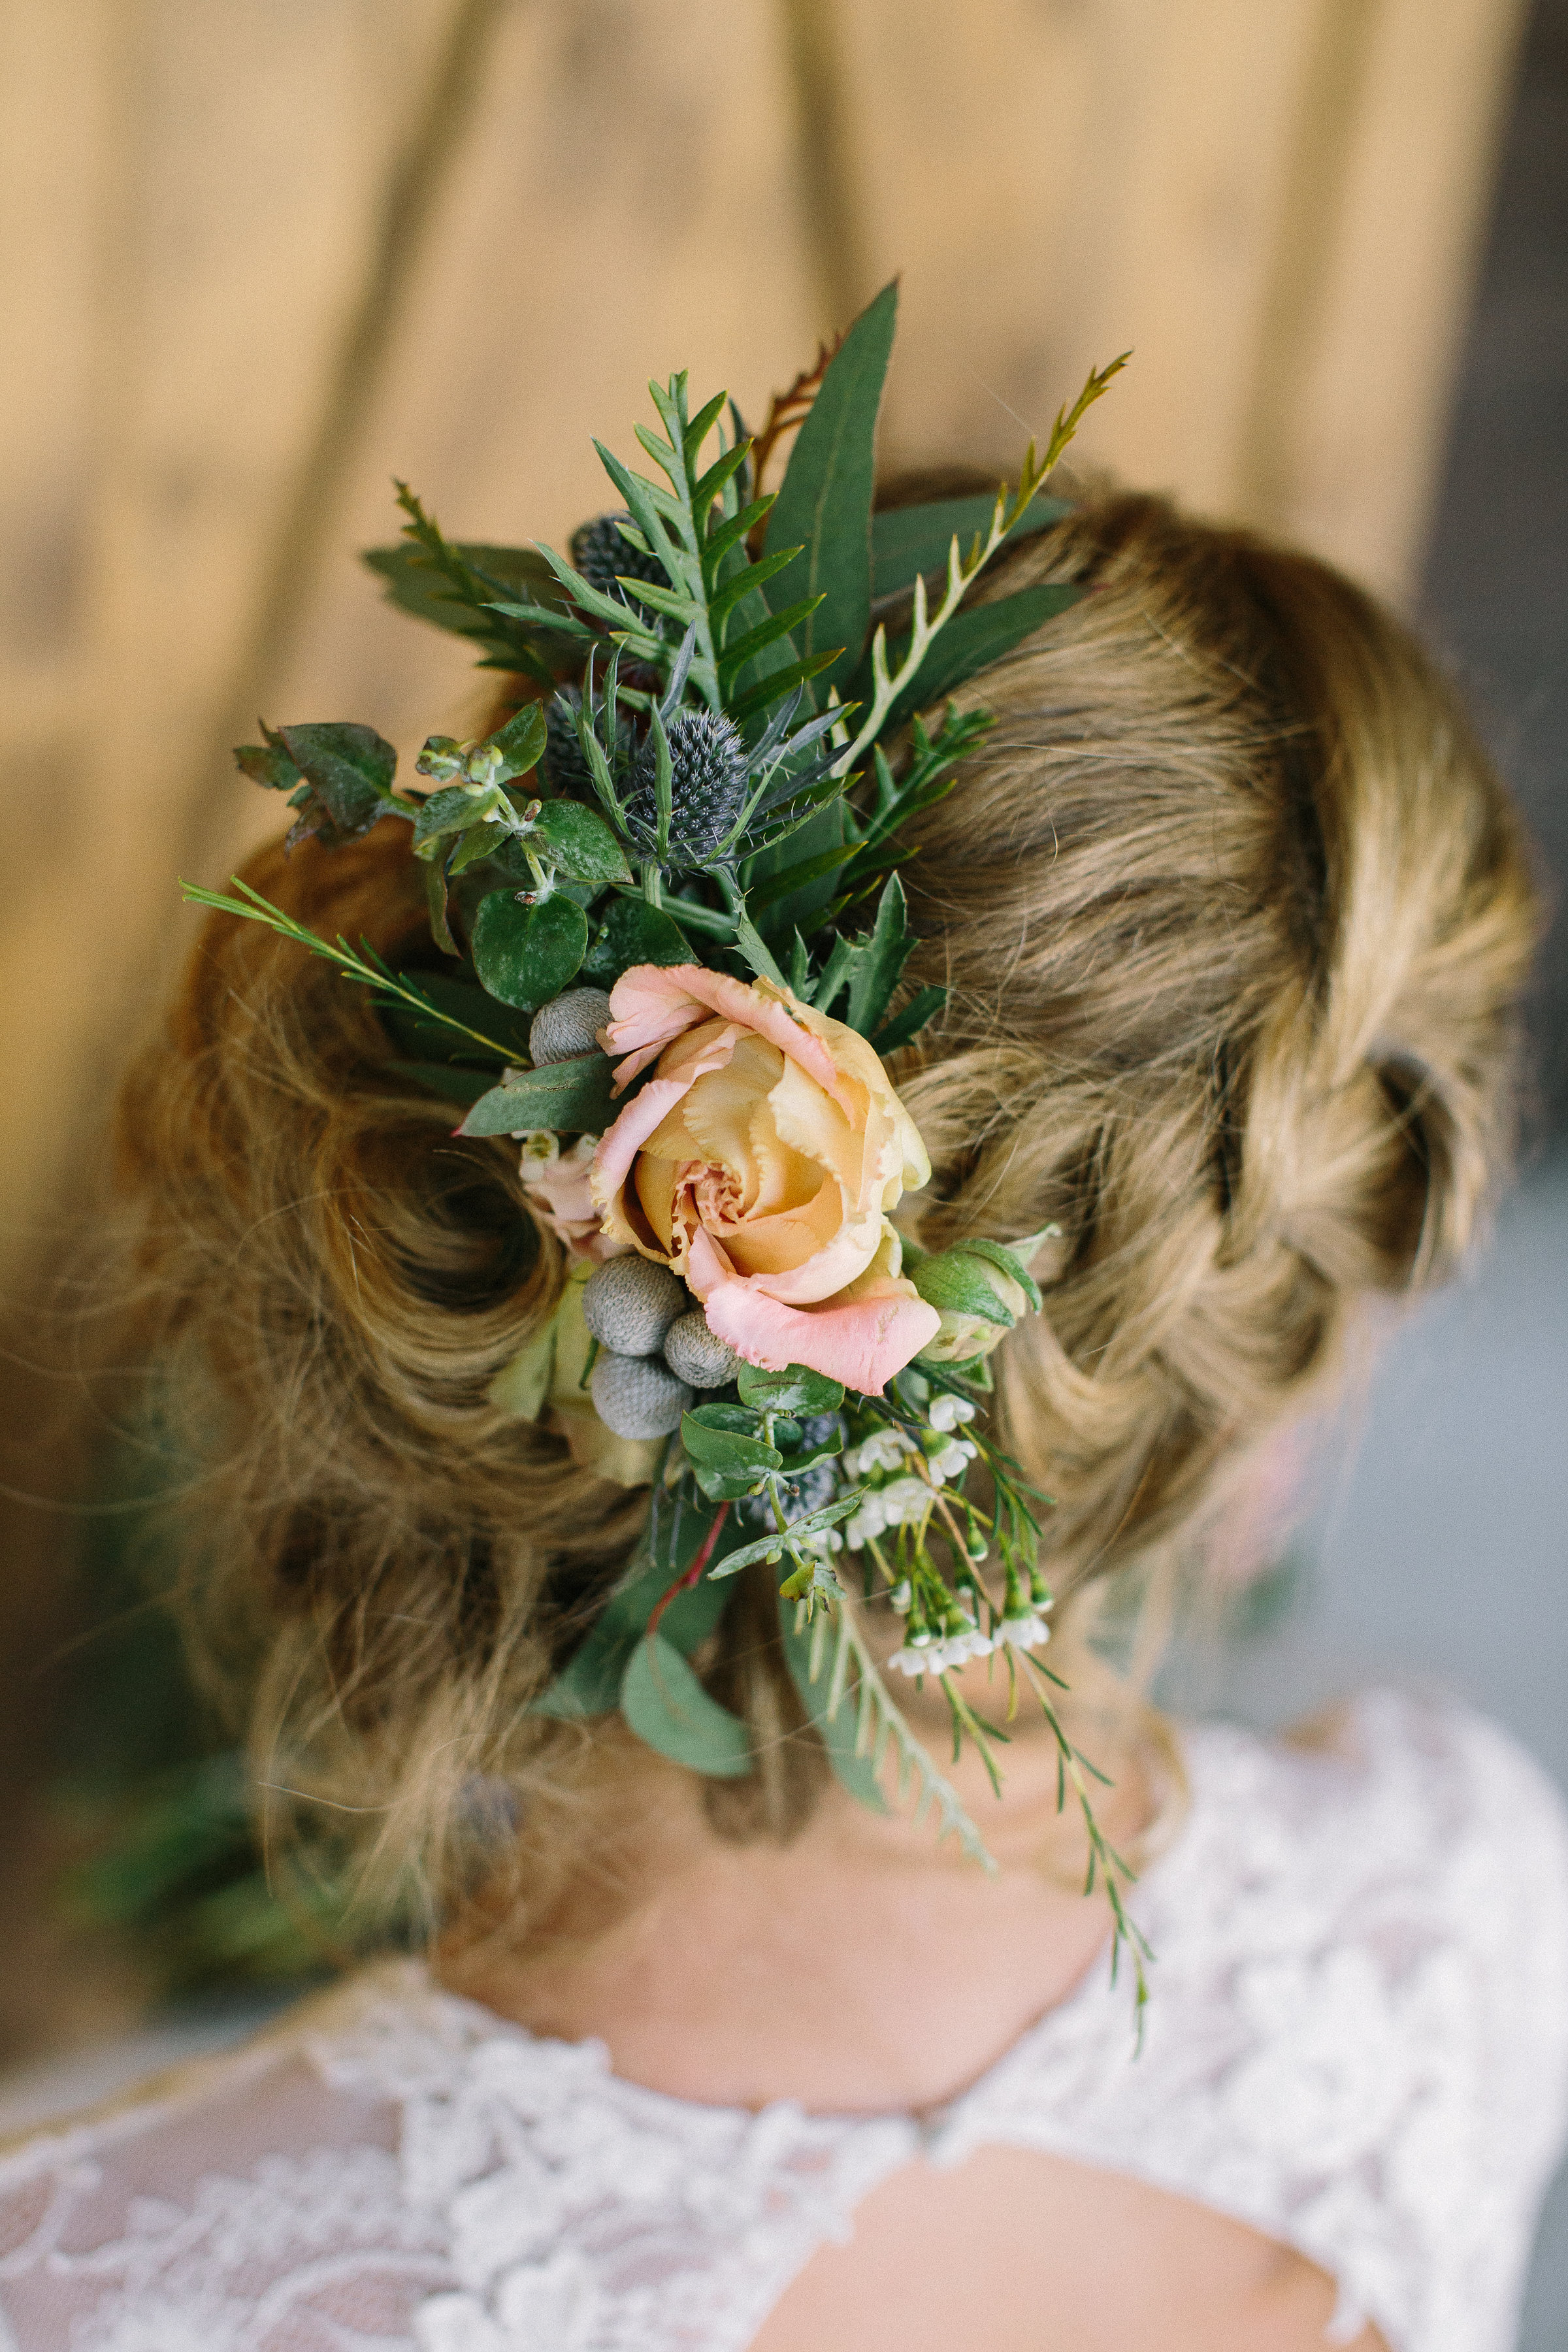 Ellen-Ashton-Photography-Peach-Creek-Ranch-Weddings-Wed-and-Prosper54